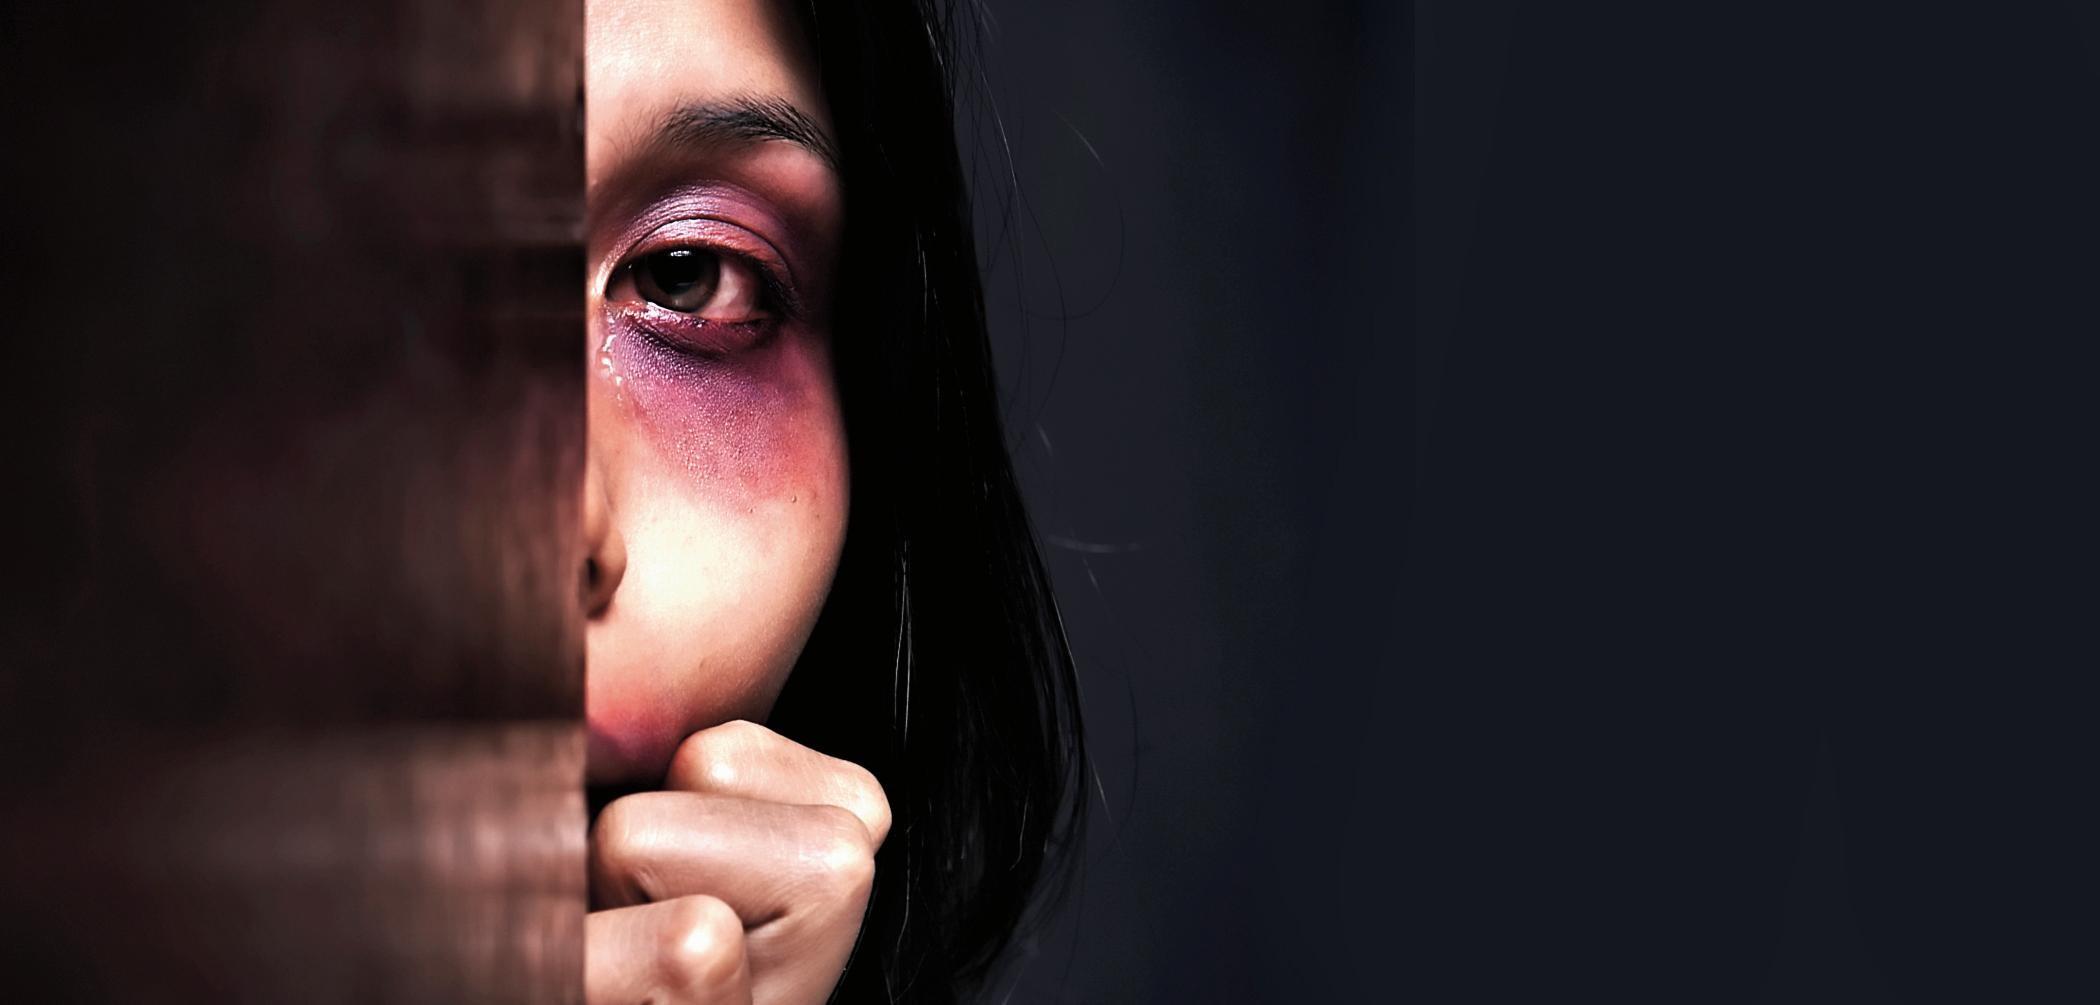 İnsan neden şiddet uygular